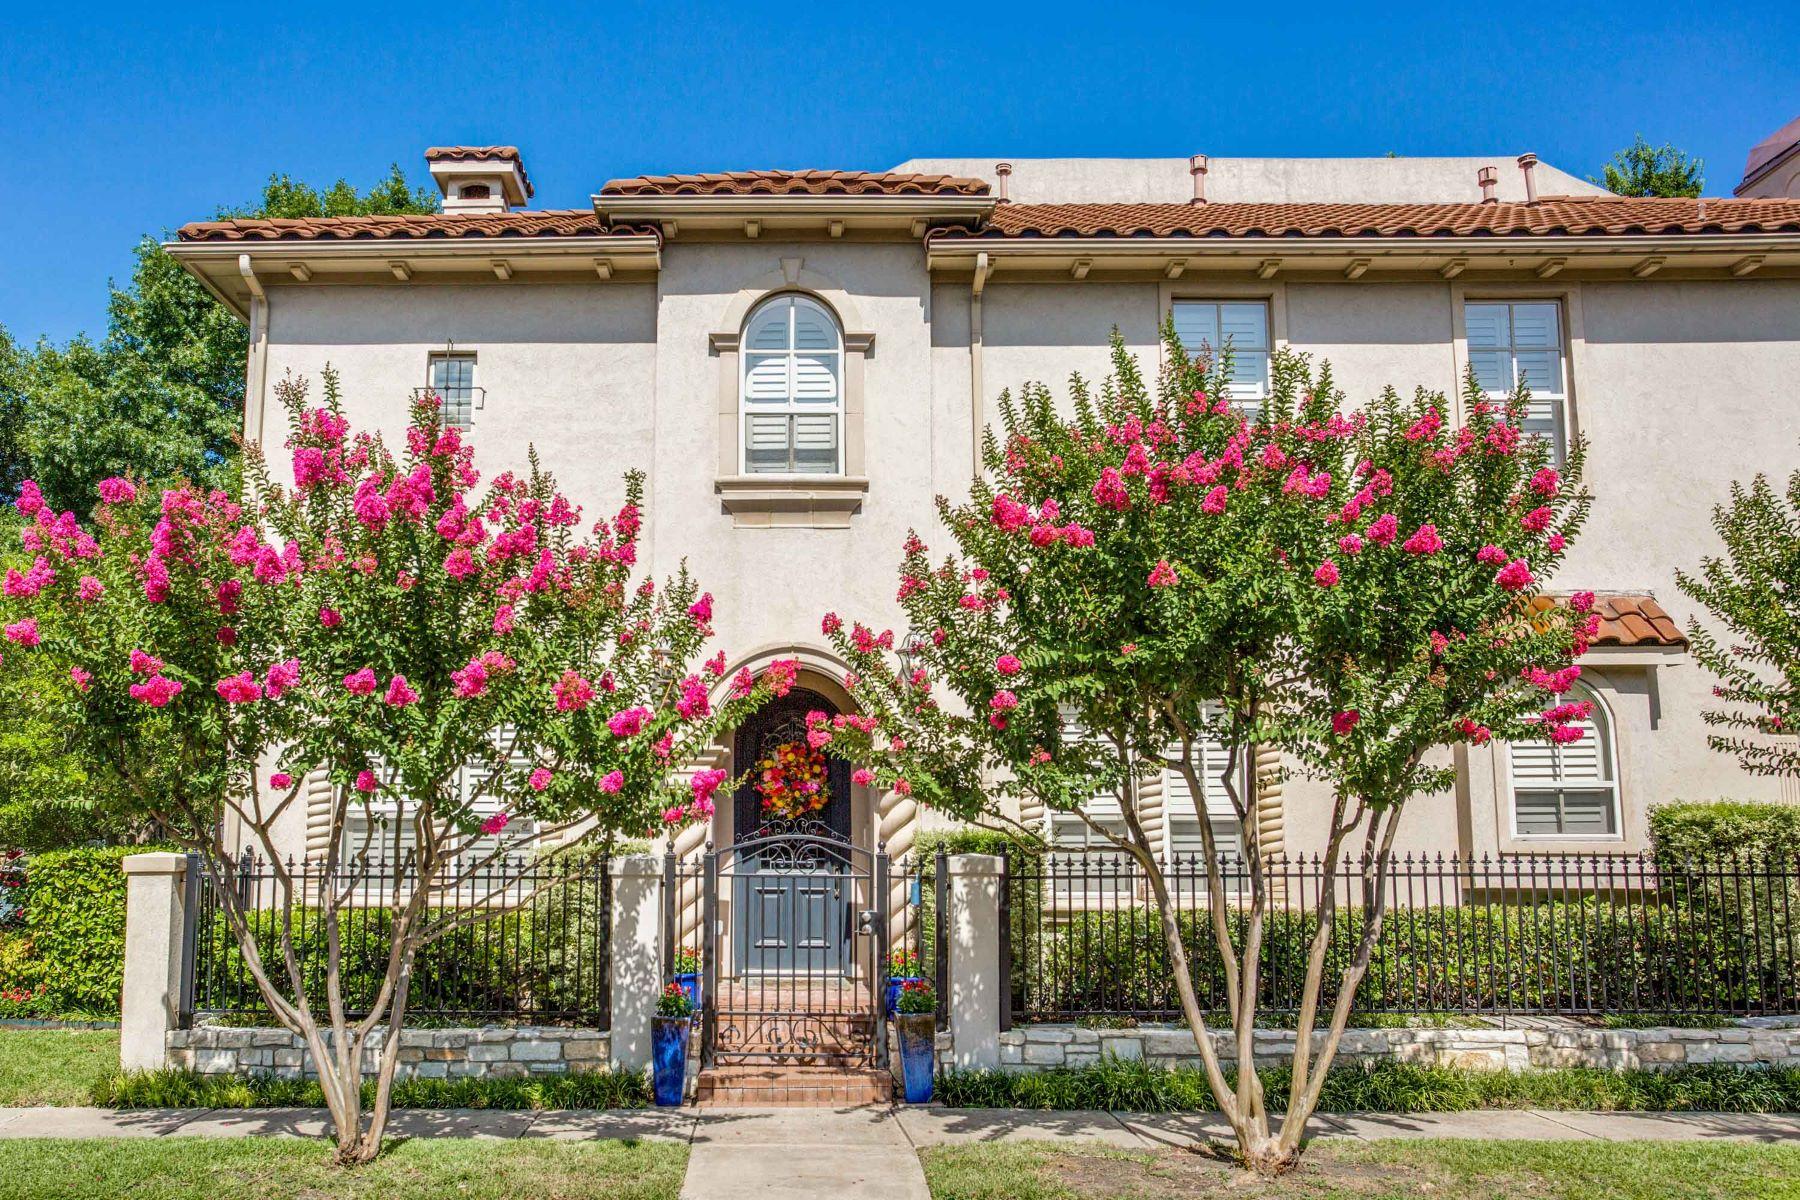 Single Family Homes for Sale at 3489 McFarlin Boulevard 3489 McFarlin Boulvard University Park, Texas 75205 United States